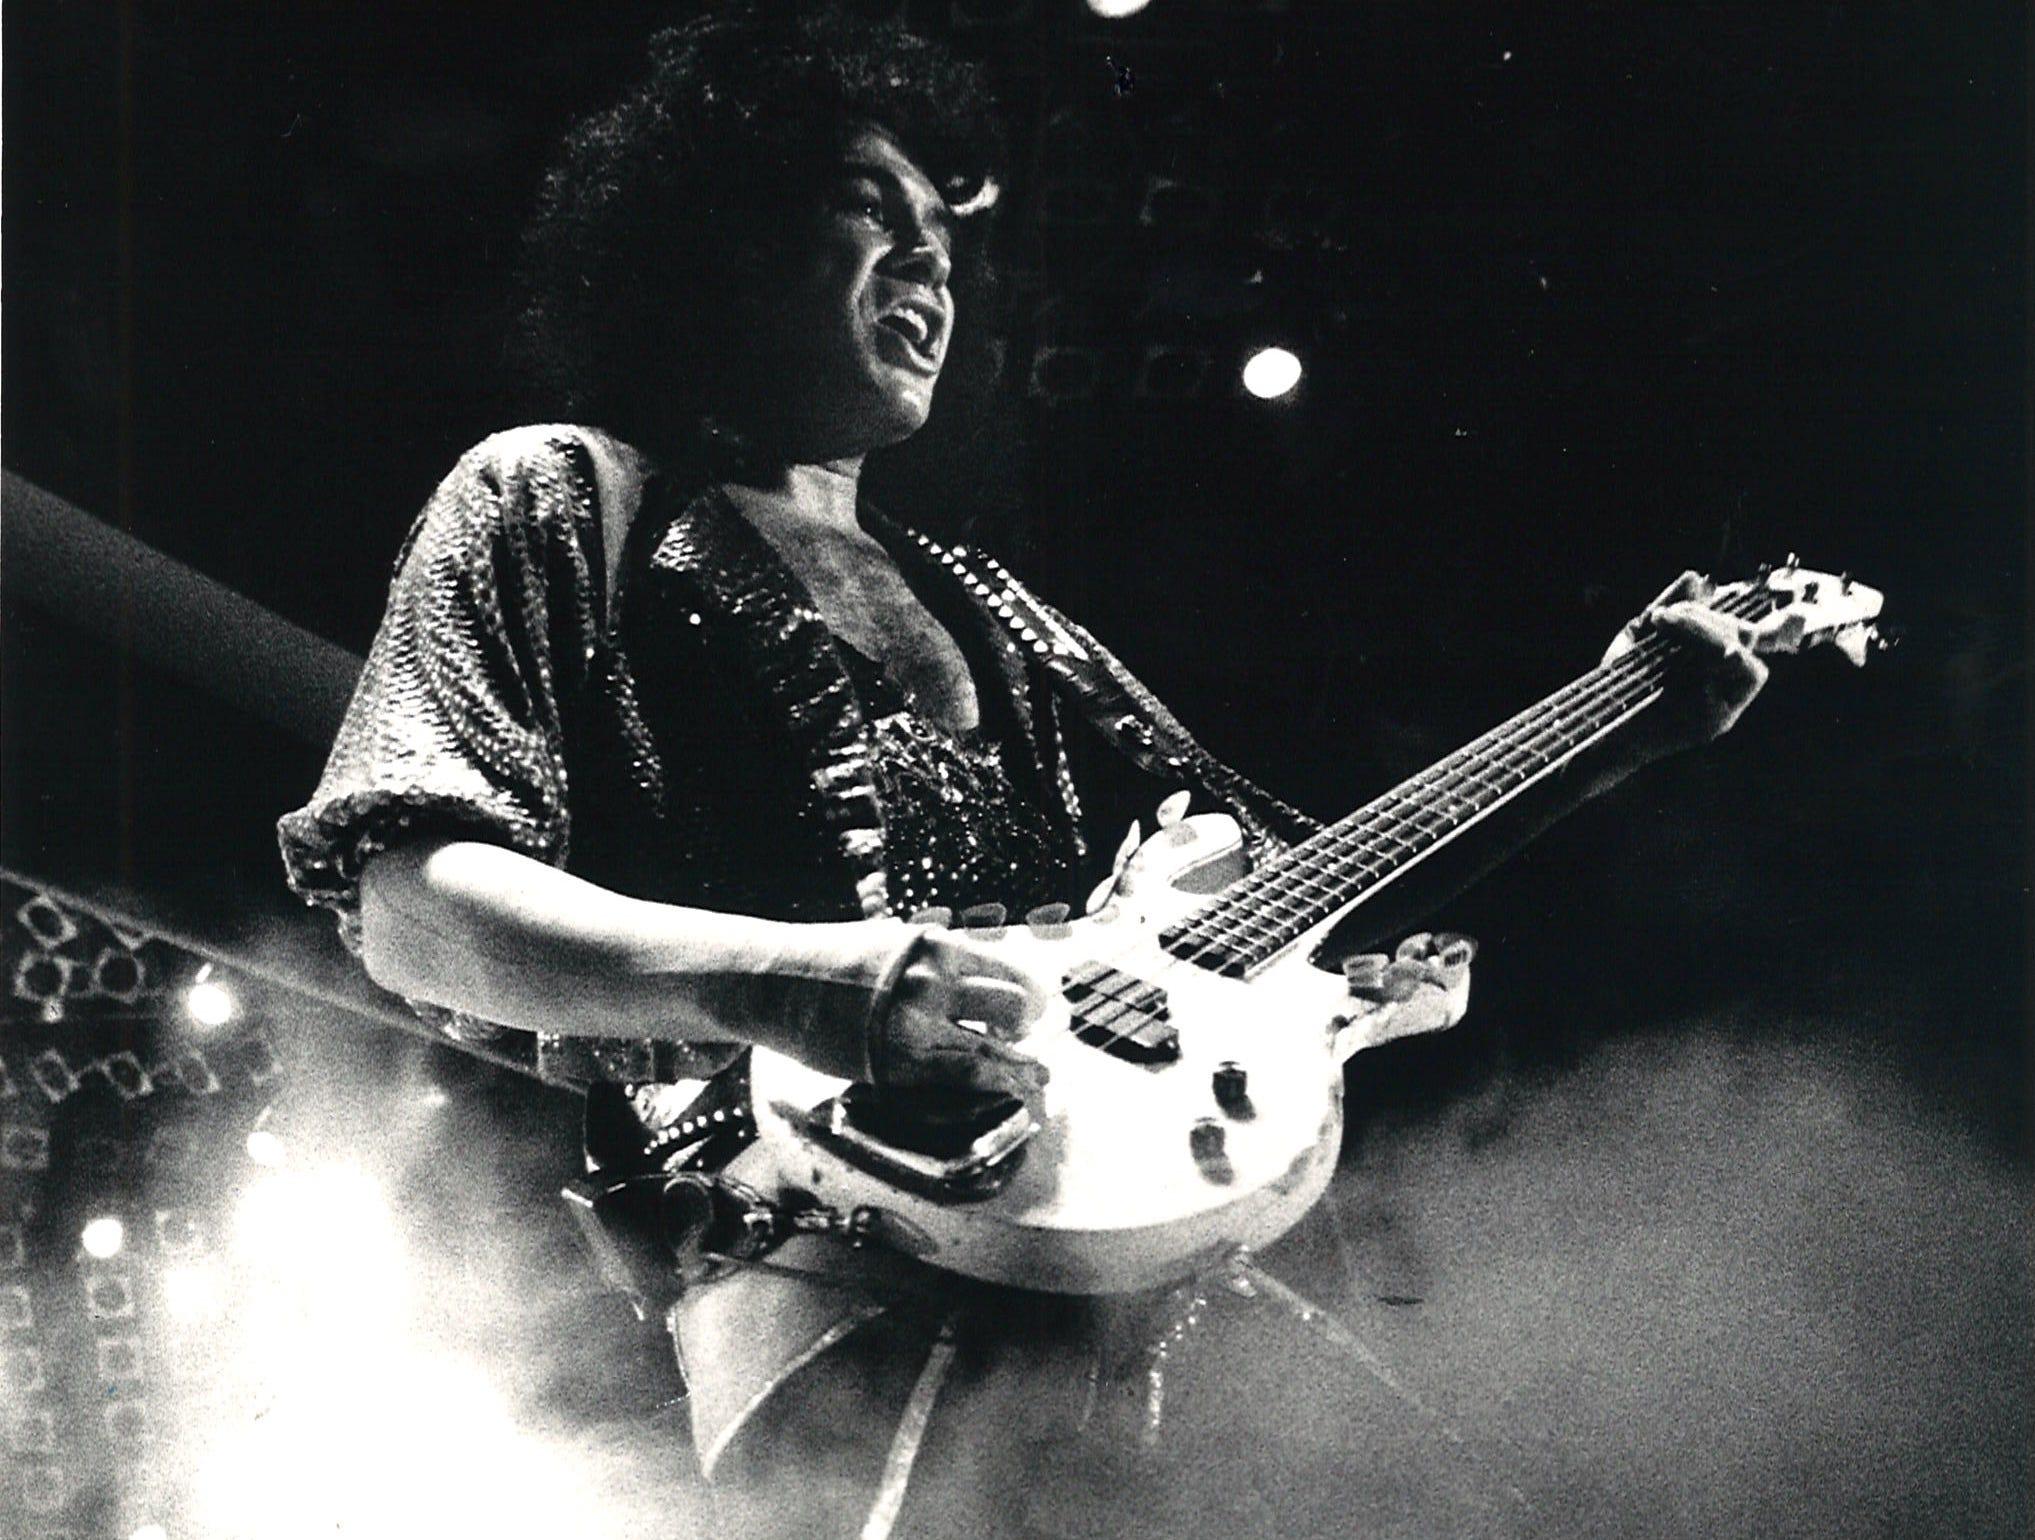 Kiss's Gene Simmons emerges from the fog at Corpus Christi's Memorial Coliseum on Feb. 24, 1986.